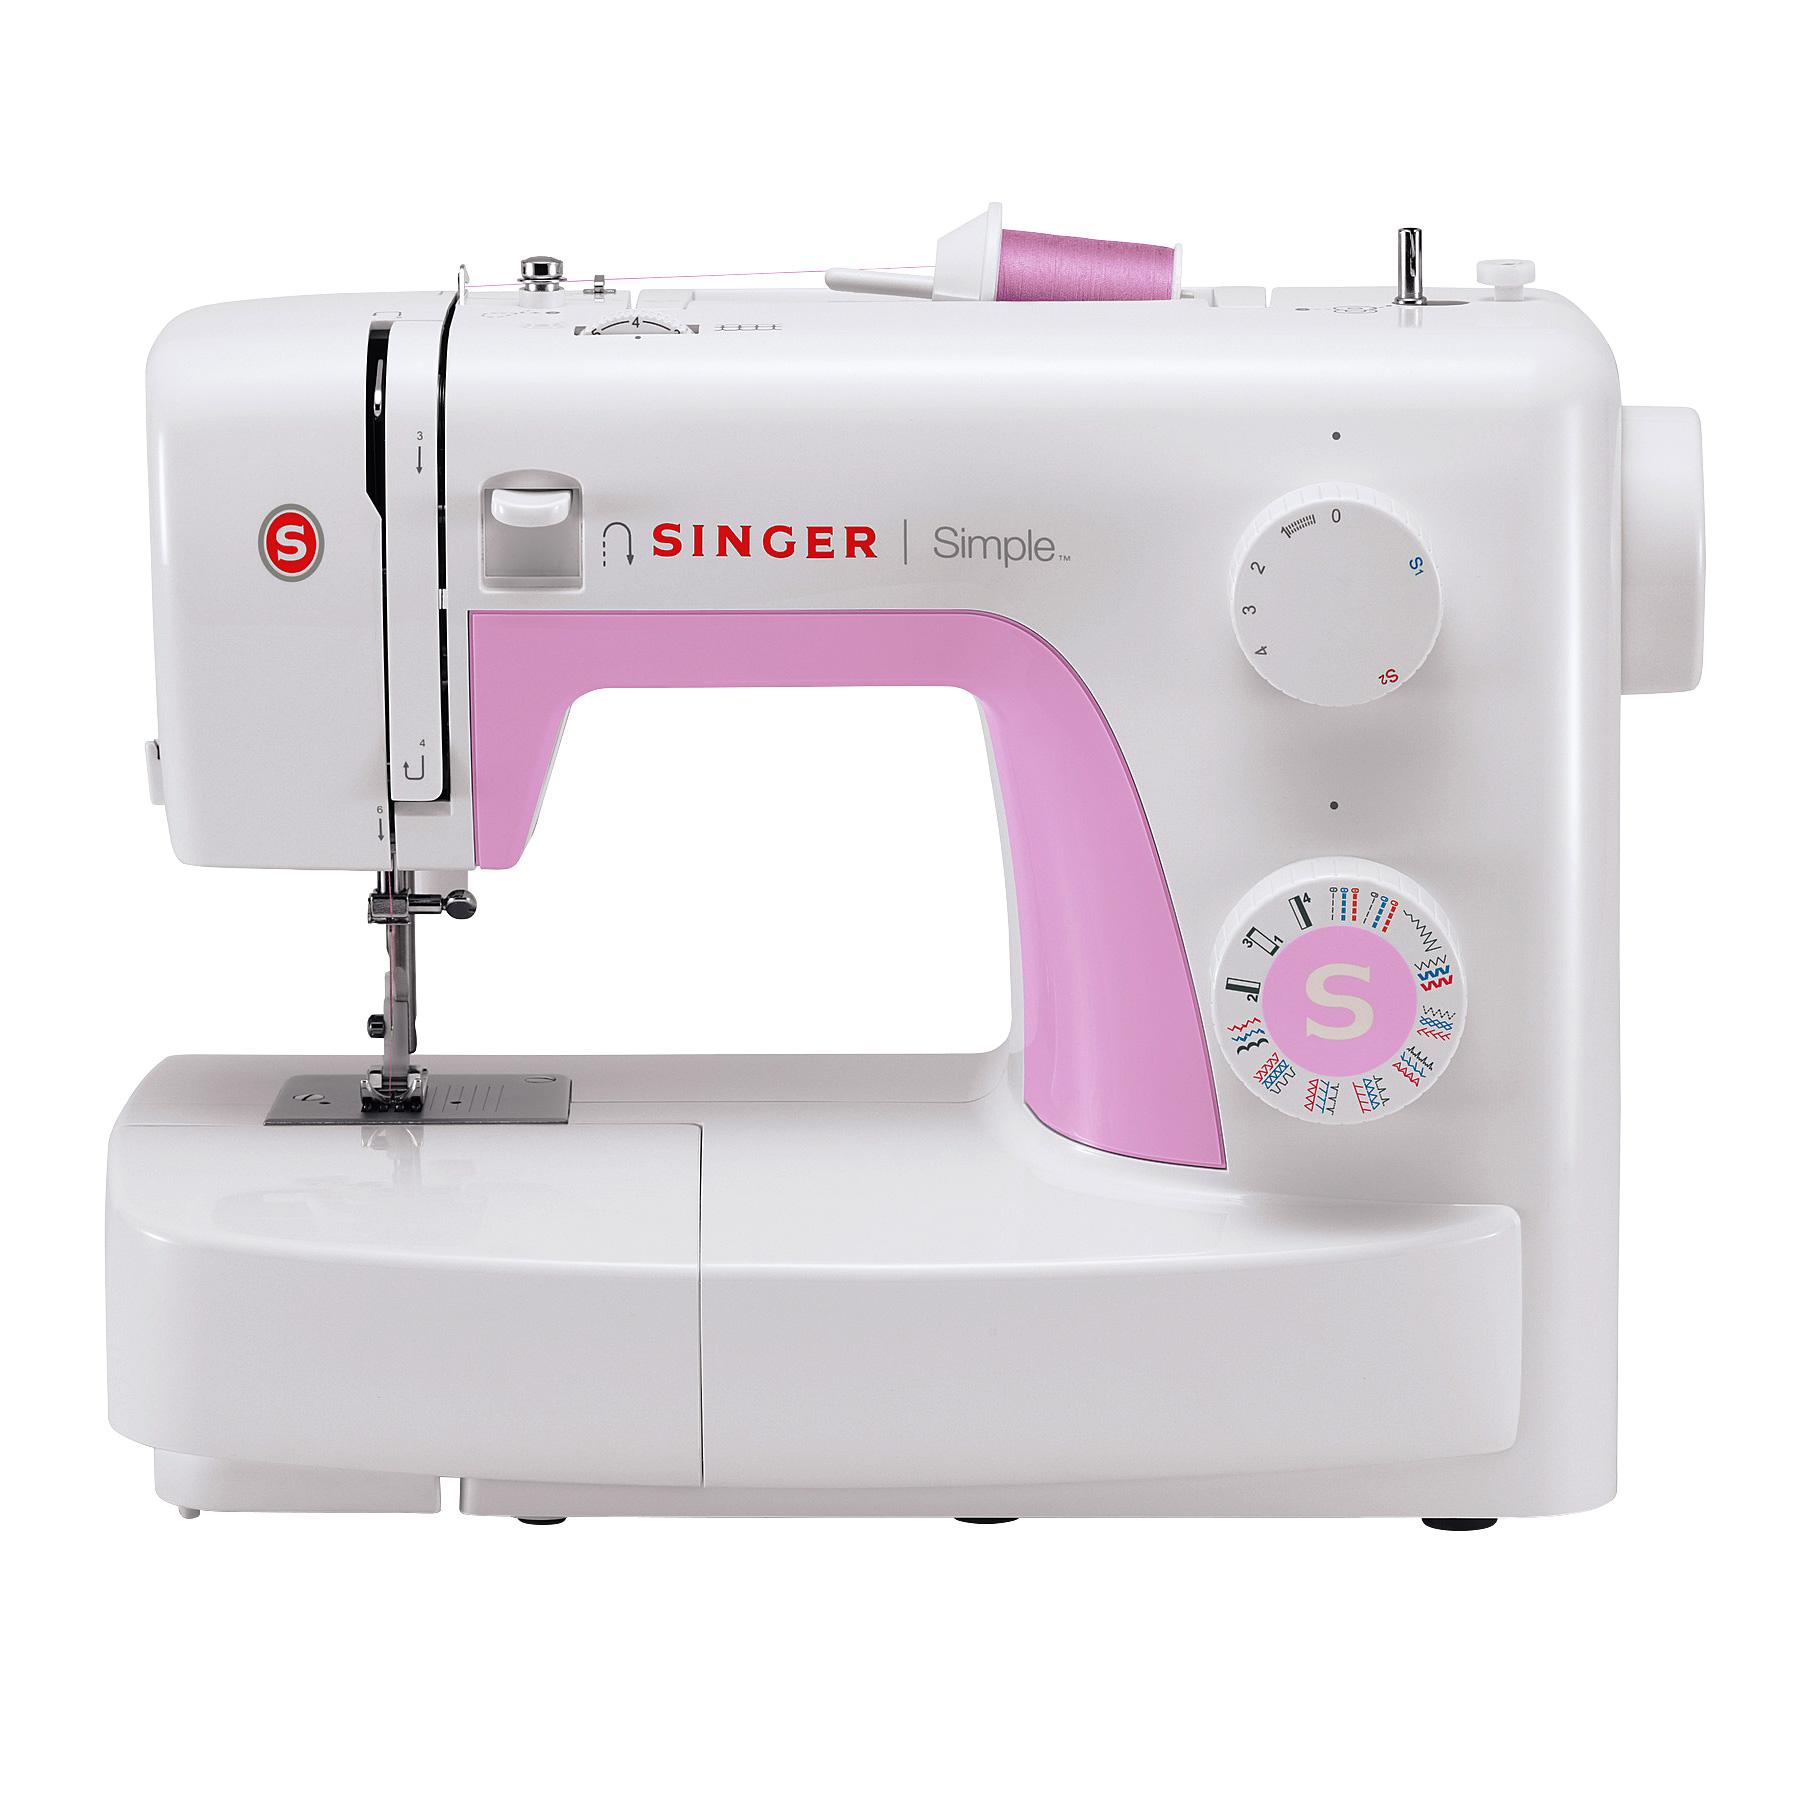 Singer simple stitch sewing machine